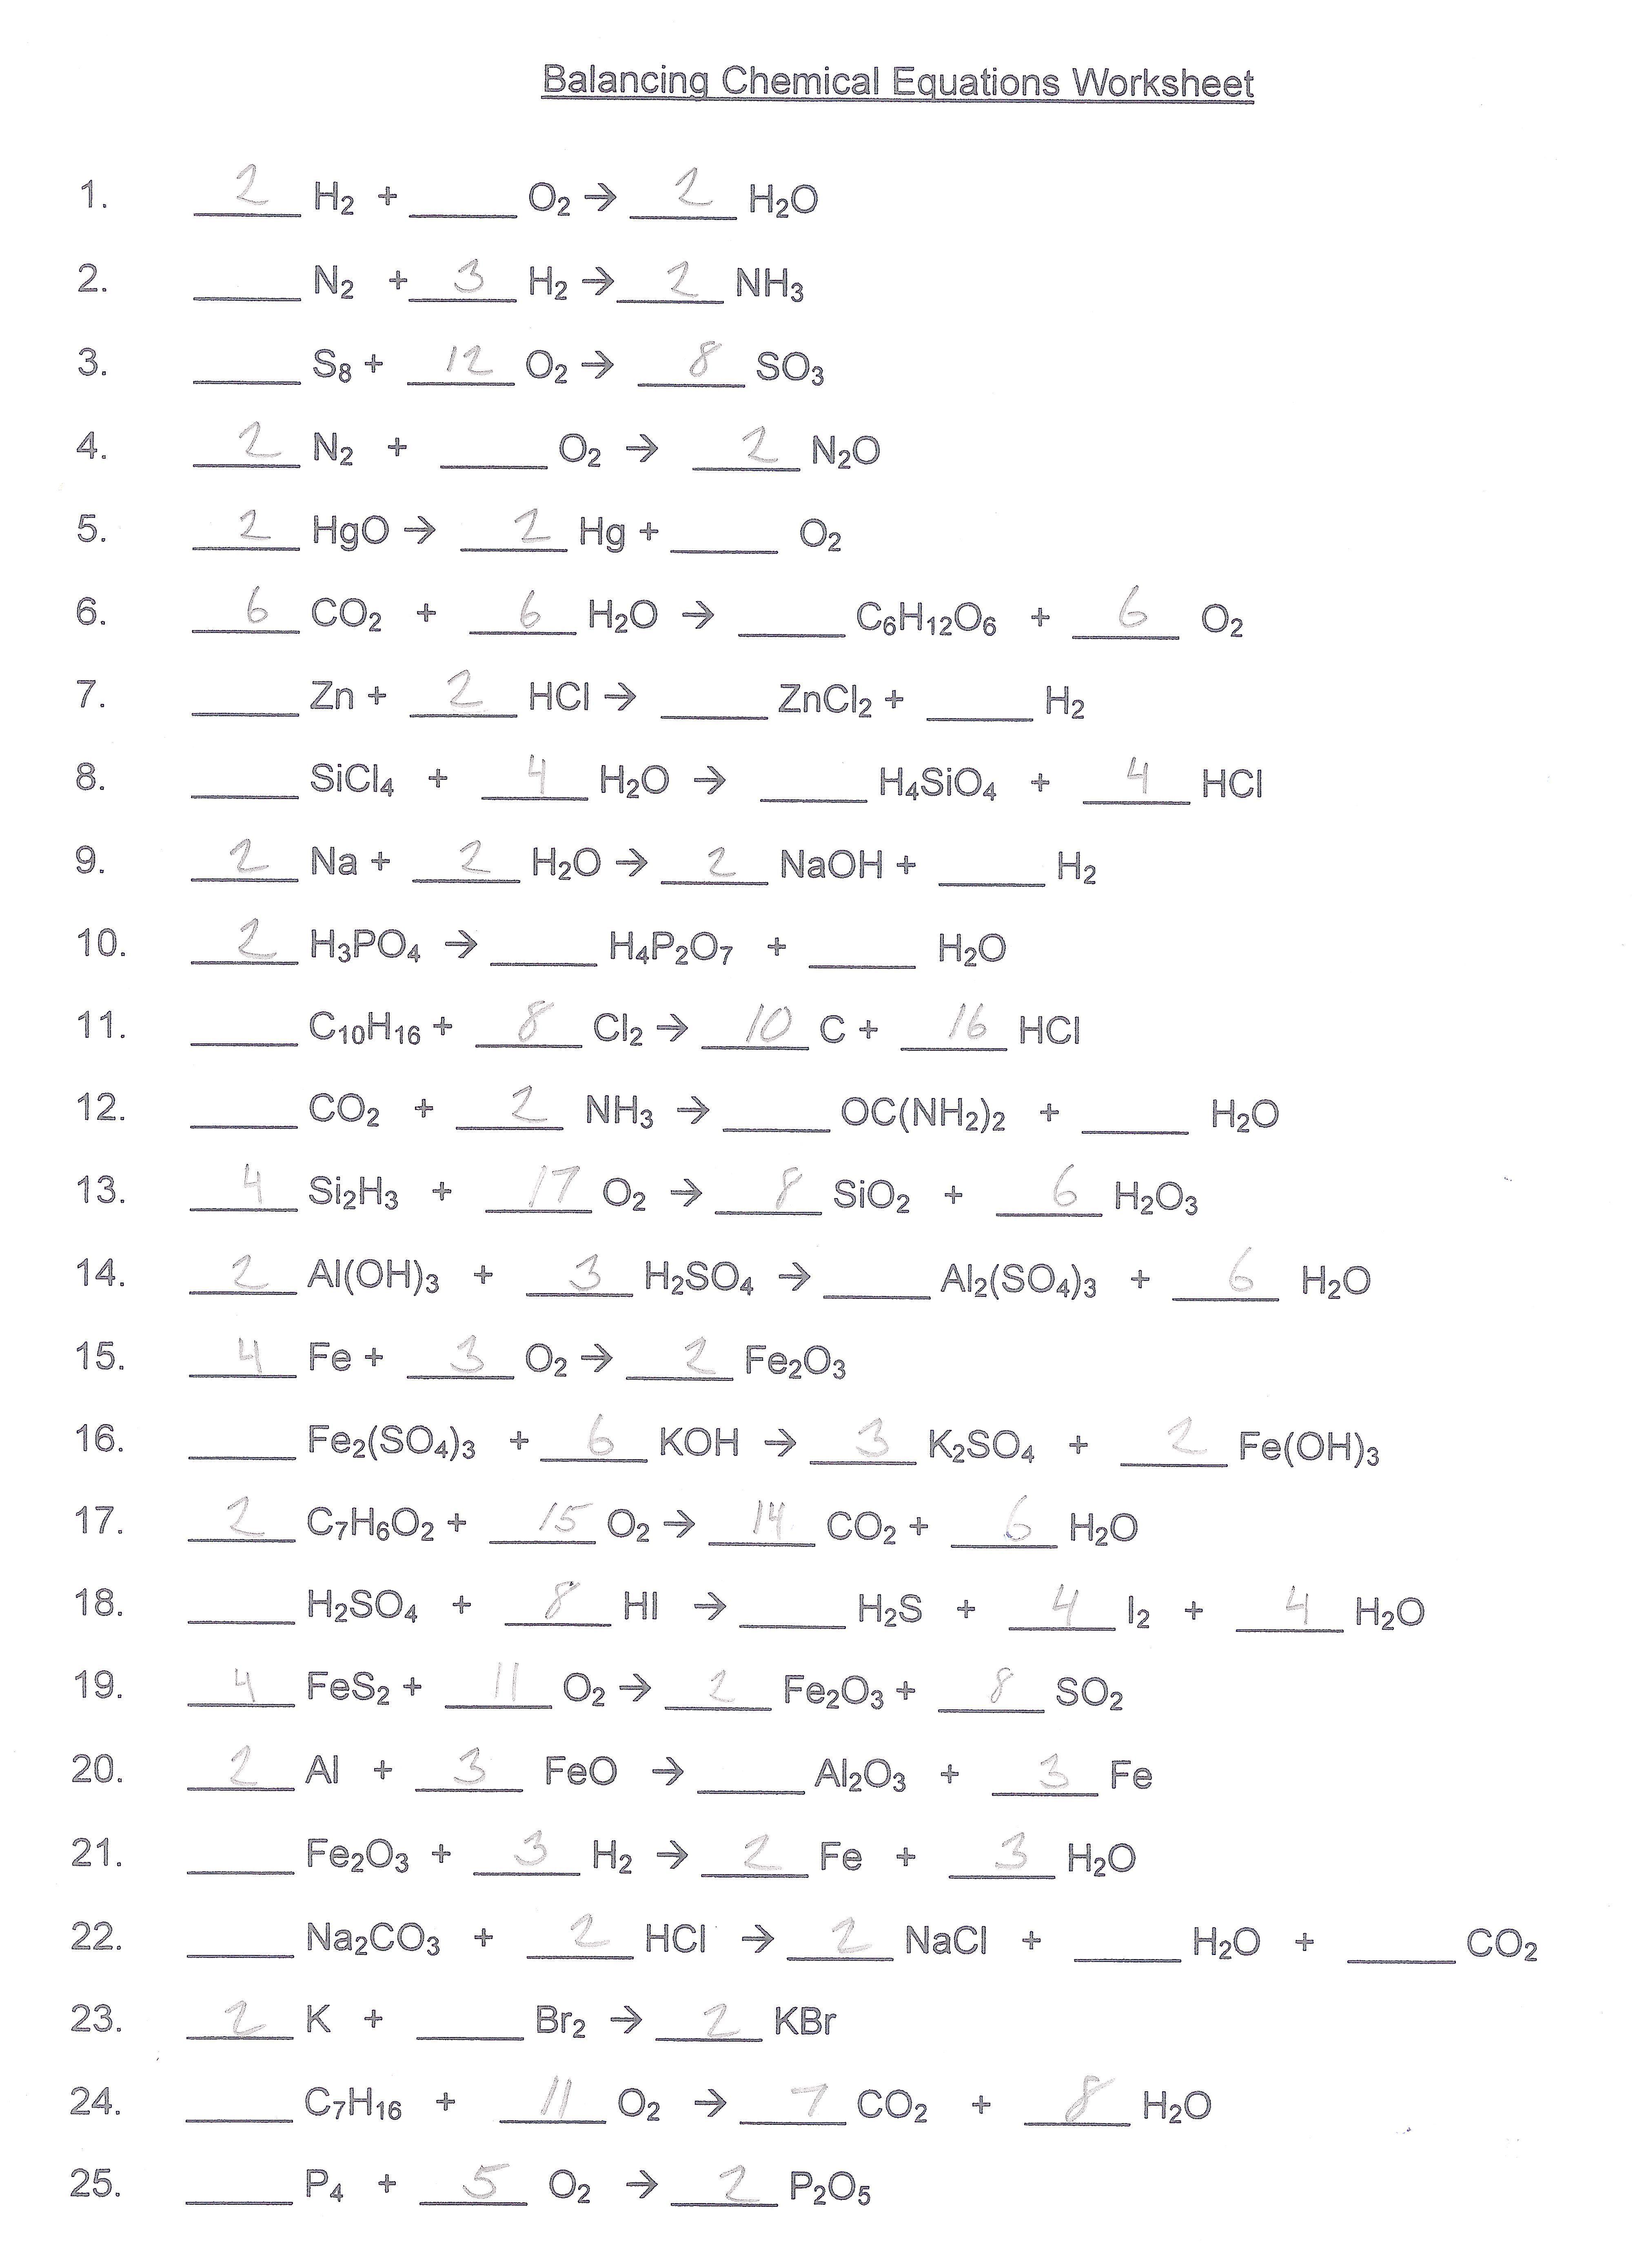 37 Simple Balancing Equations Worksheet Ideas Https Bacamajalah Com 37 Simple Balancing Equation In 2020 Chemical Equation Chemistry Worksheets Balancing Equations